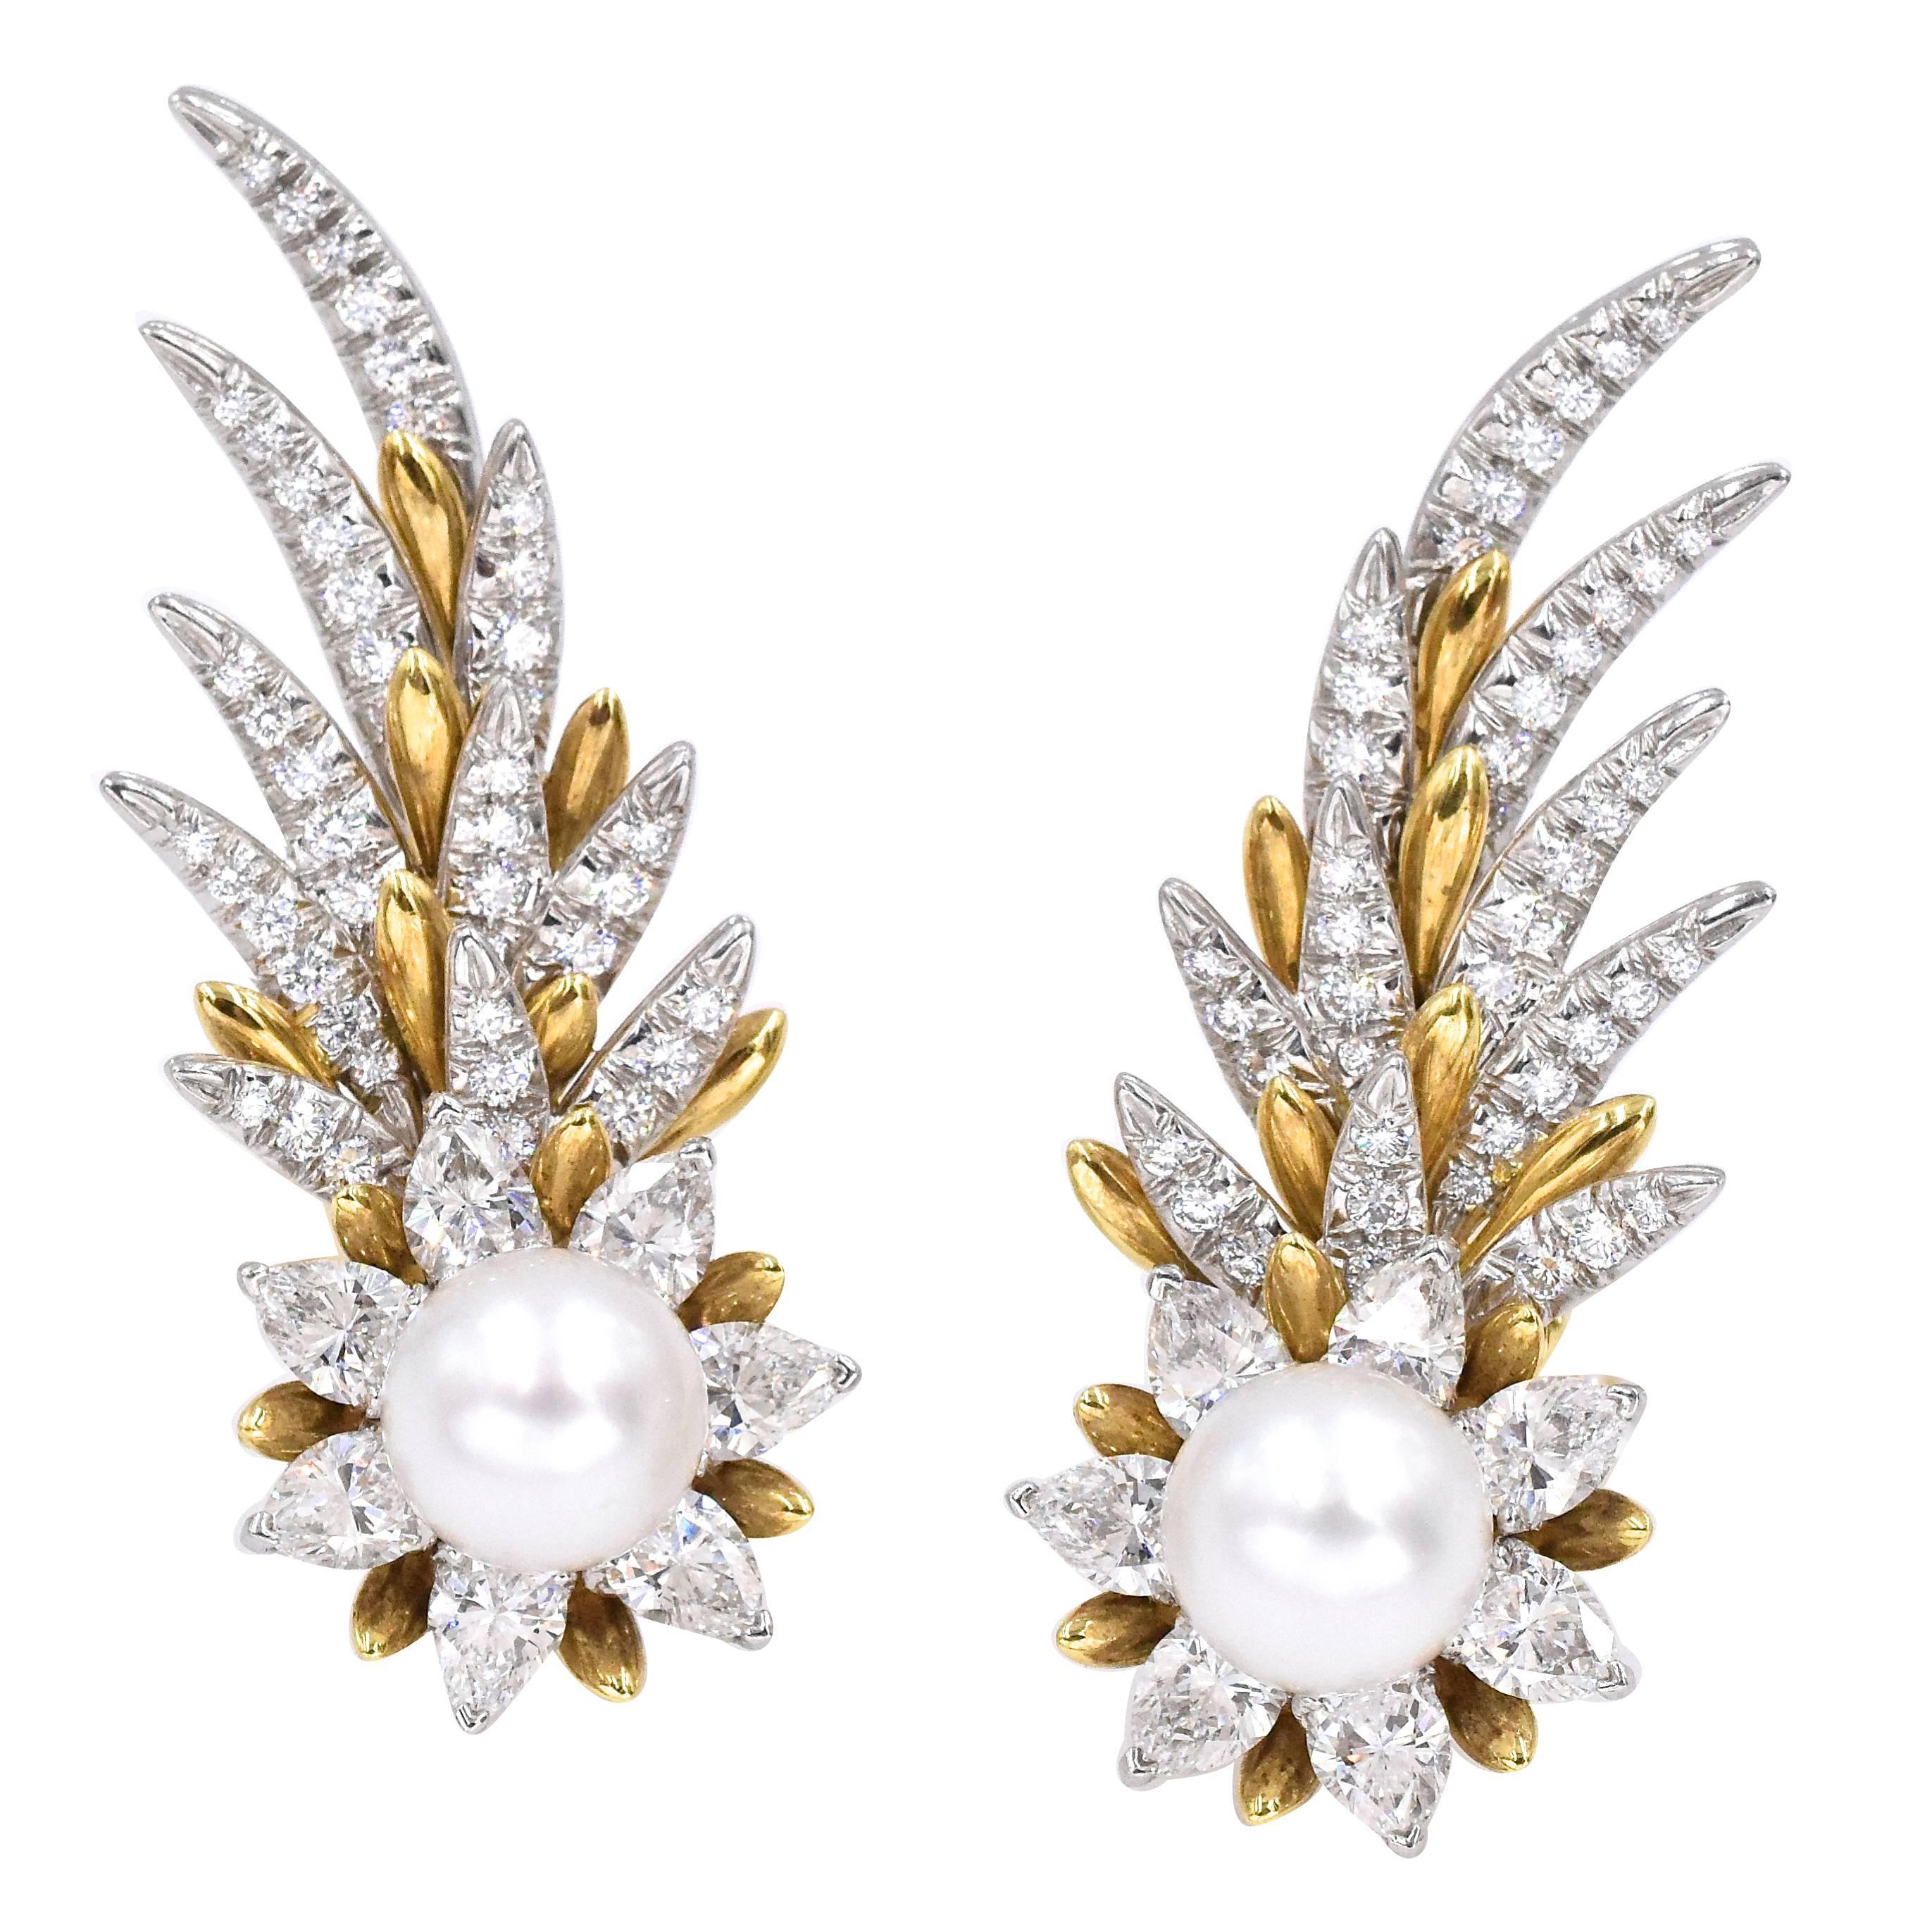 Tiffany & Co. Jean Schlumberger Flame Ear Clips